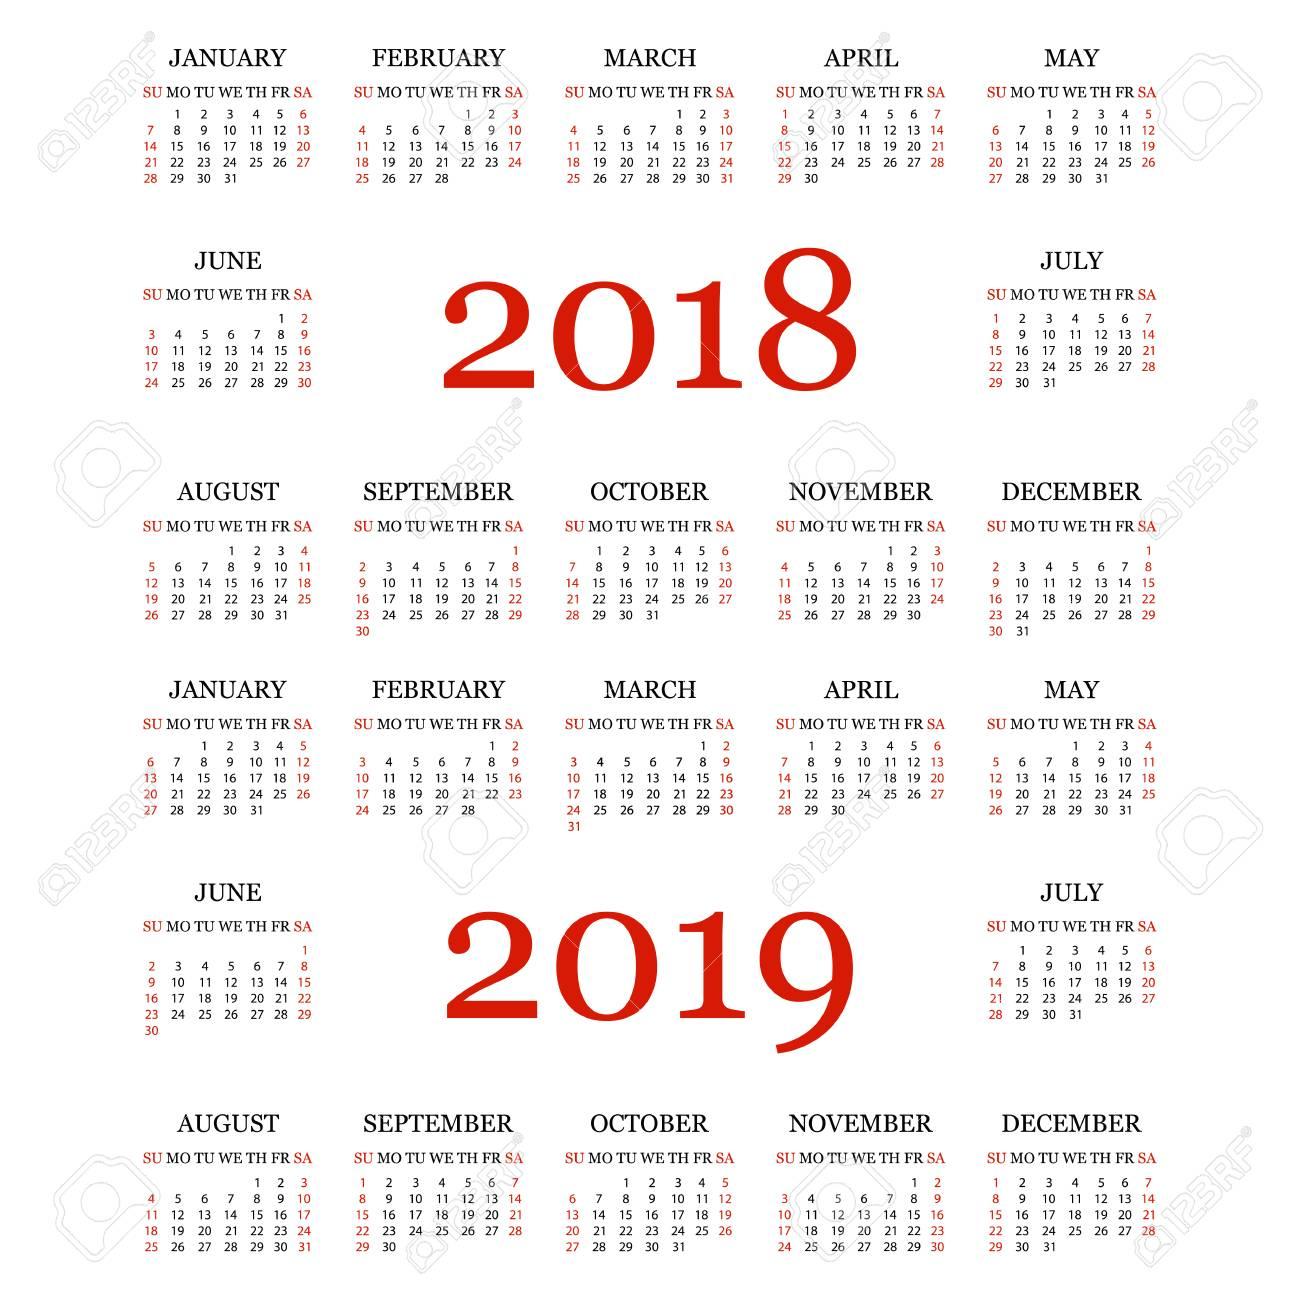 Calendario 2018 2019.Calendar 2018 2019 Simple Calendar Template For Year 2018 And